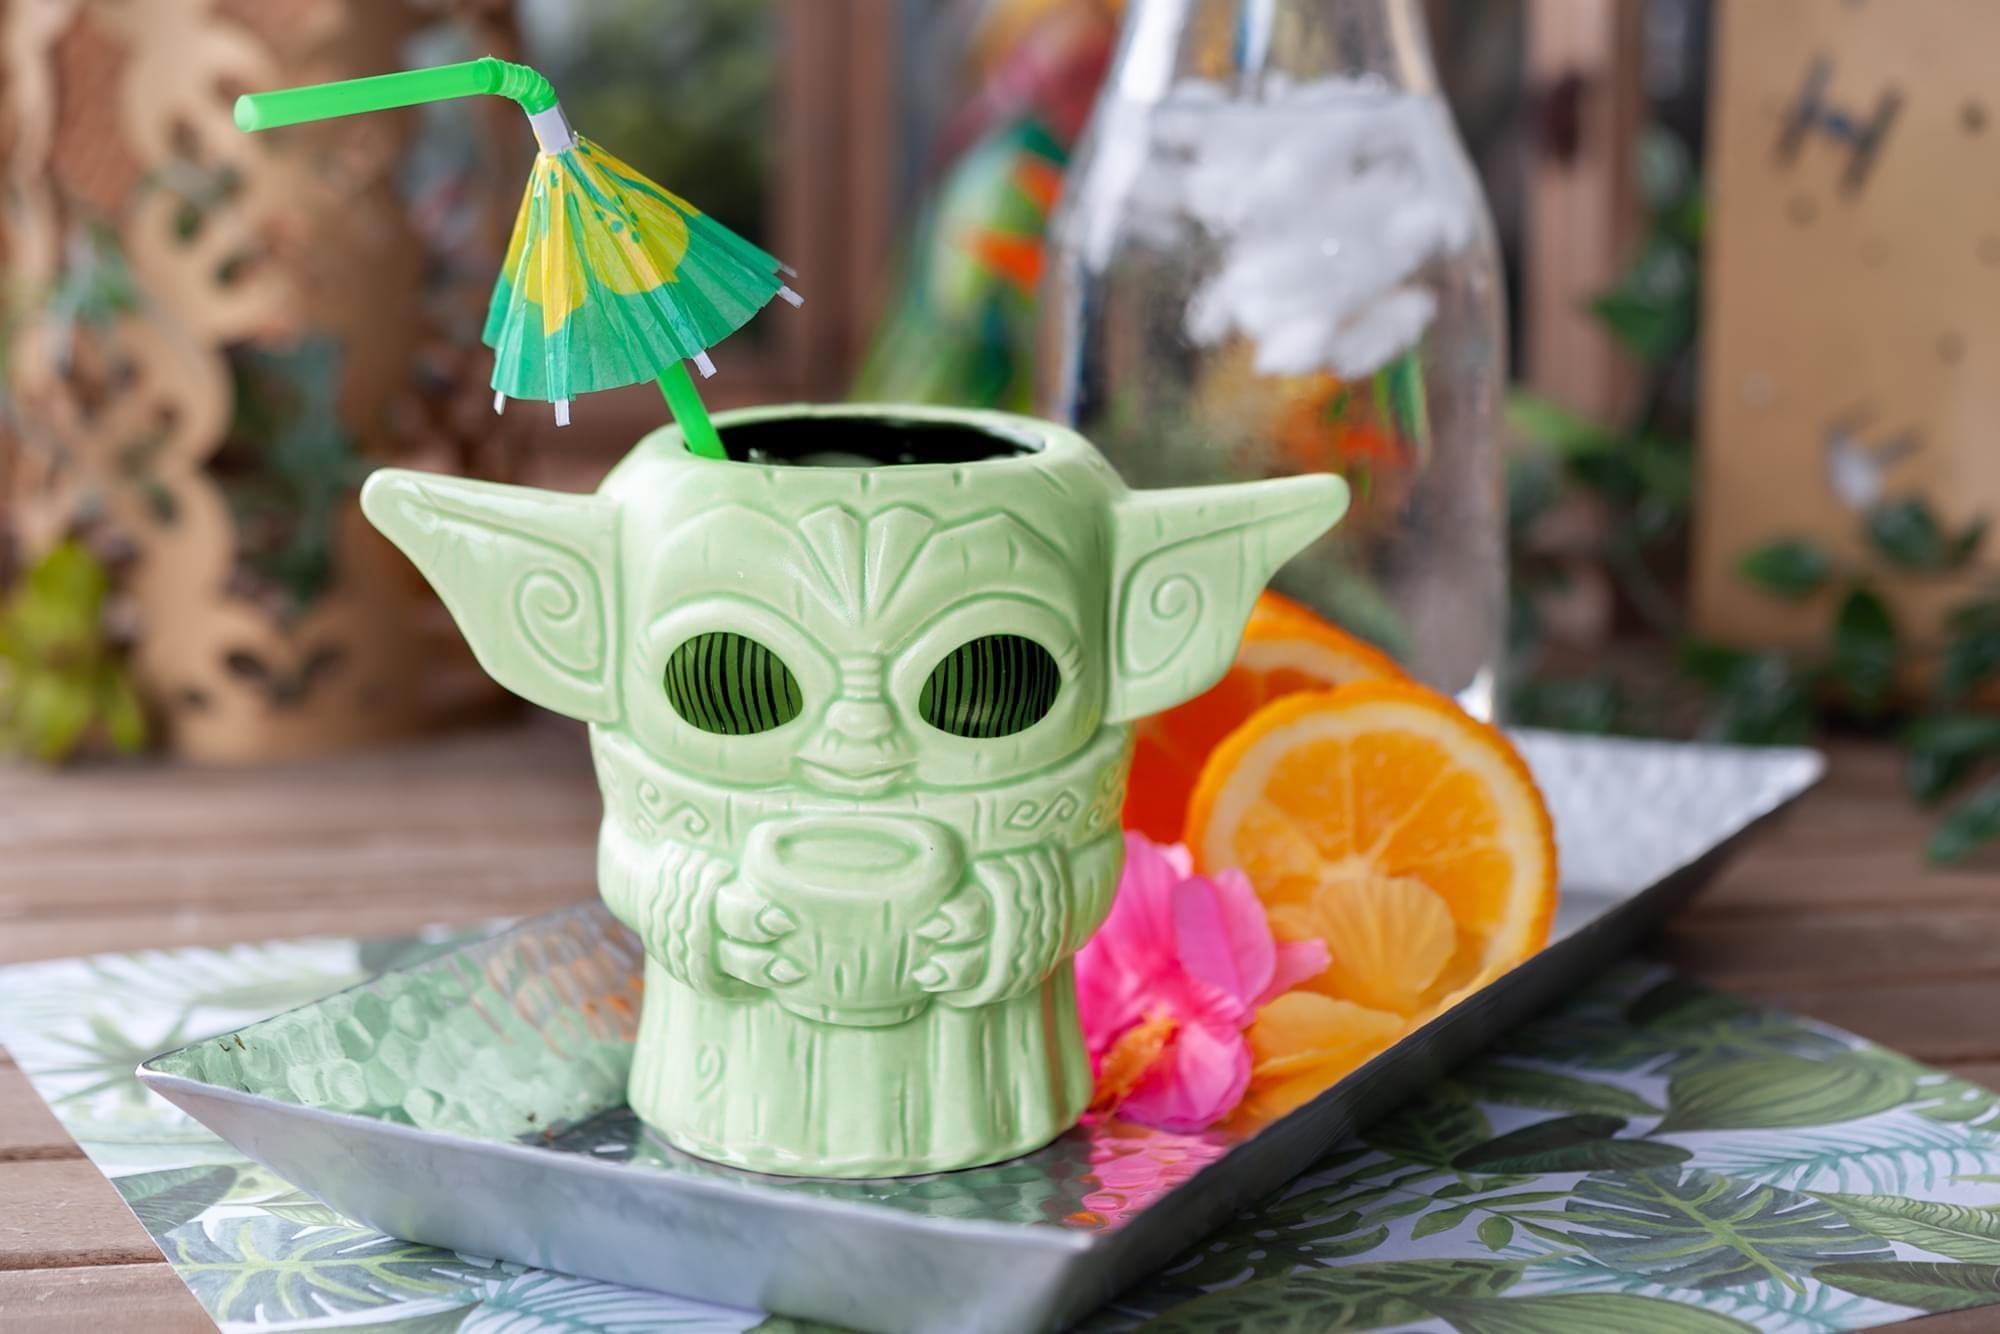 The green handle-less mug shaped like The Child